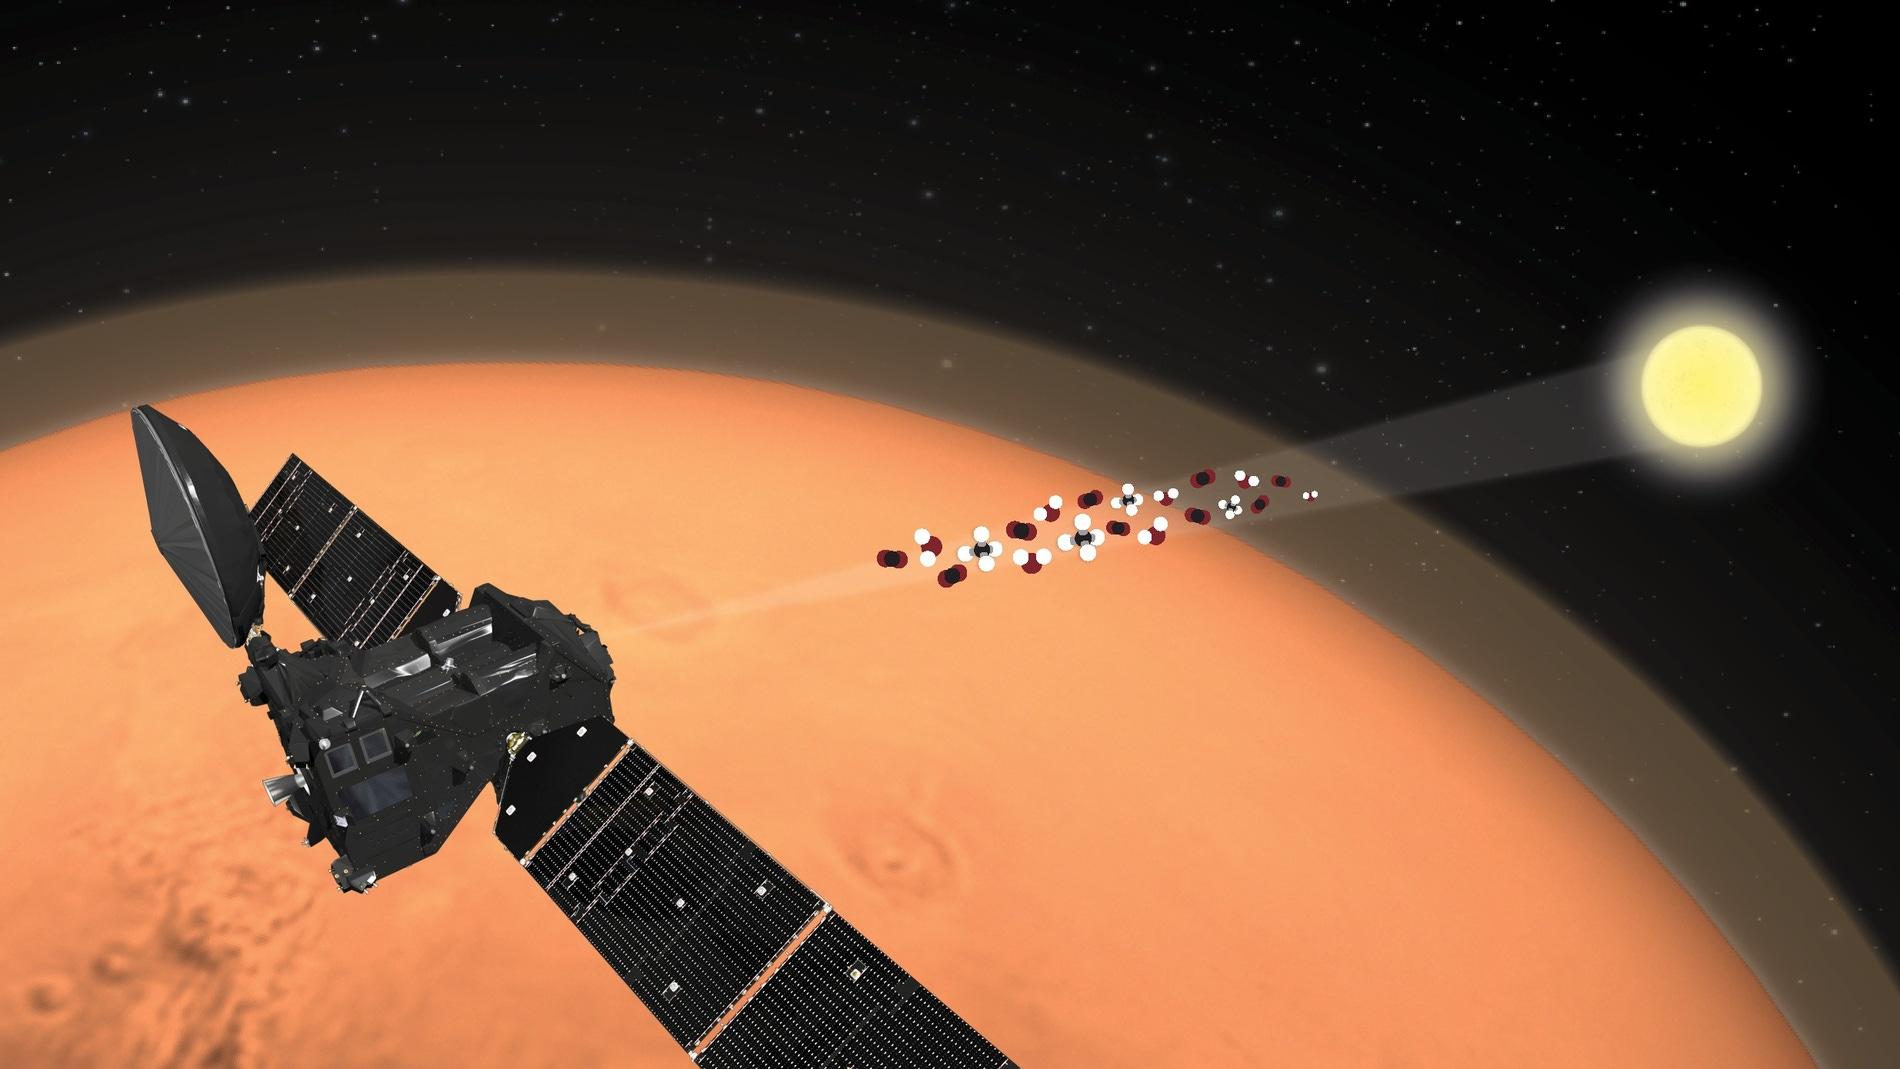 La sonda ExoMars TGO manda los primeros datos sobre la atmosfera de Marte